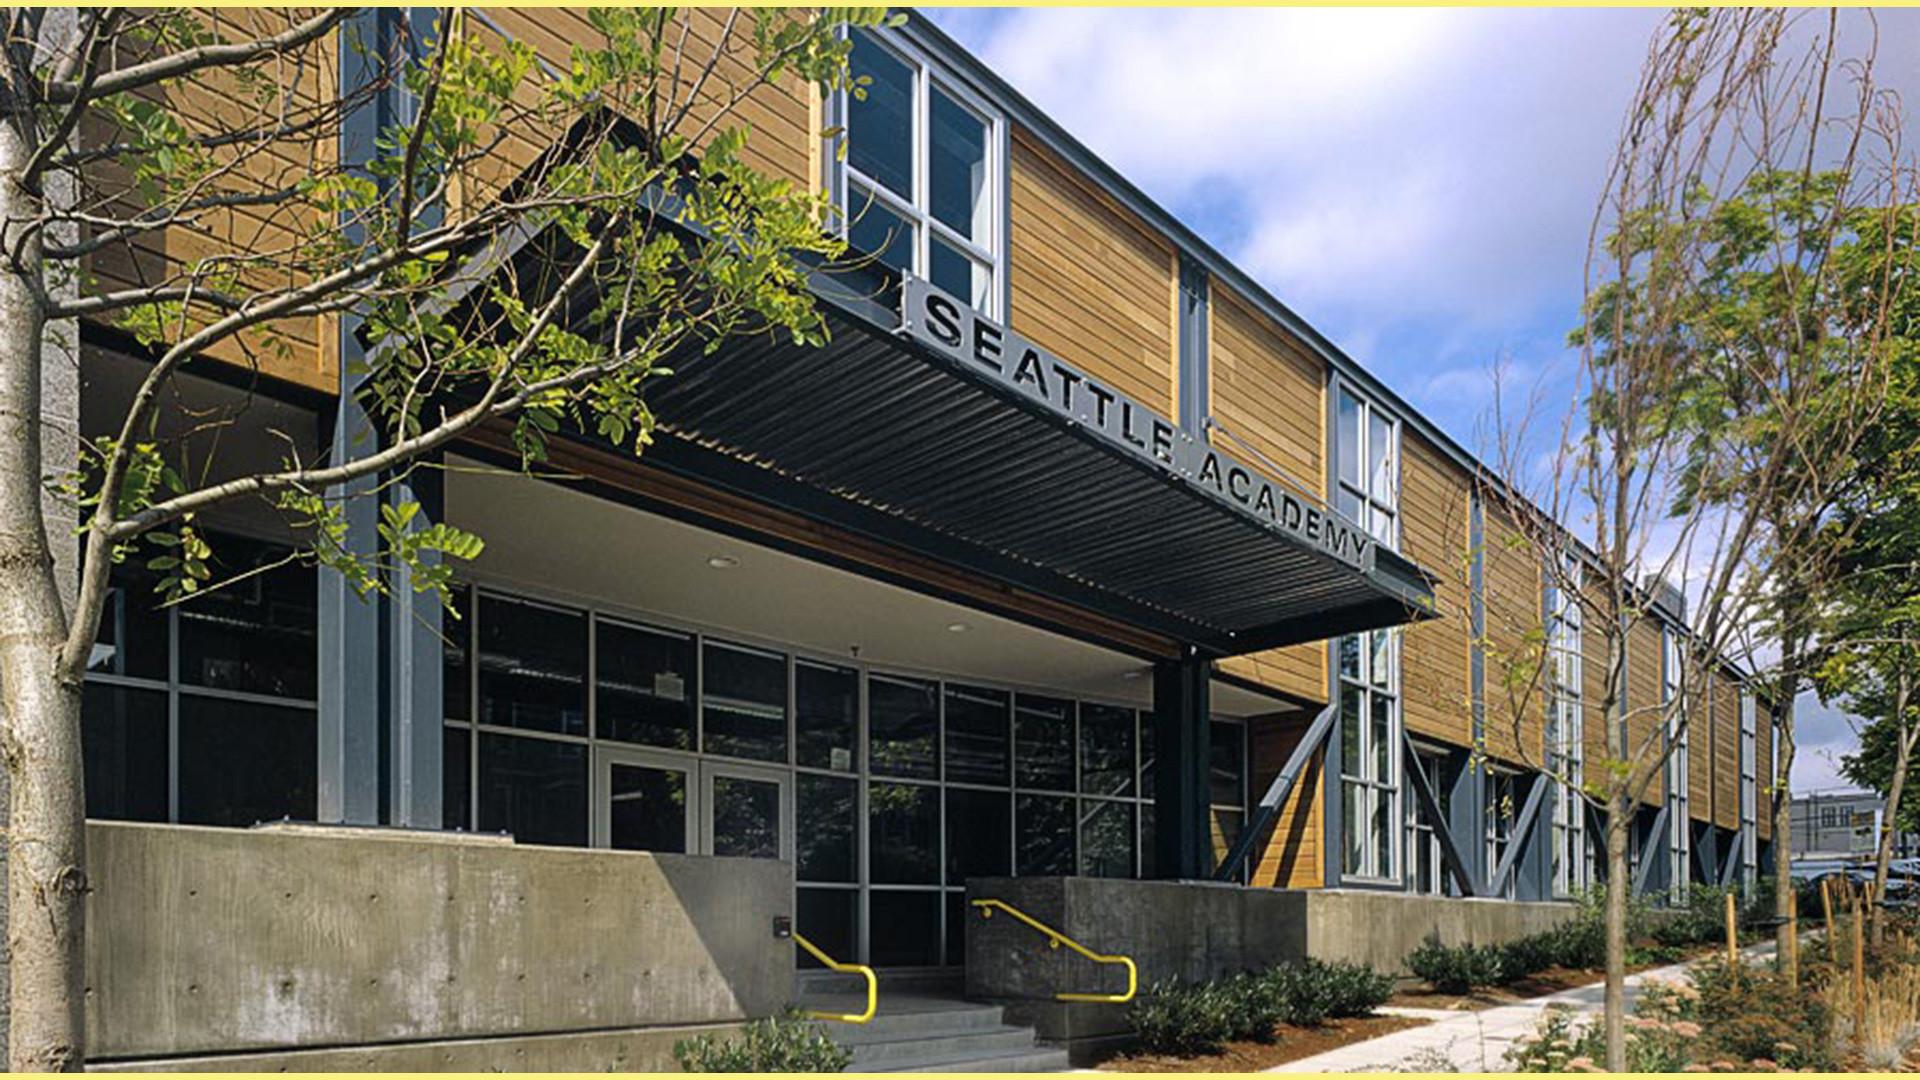 Seattle Academy Gymnasium  Swenson Say Fagt